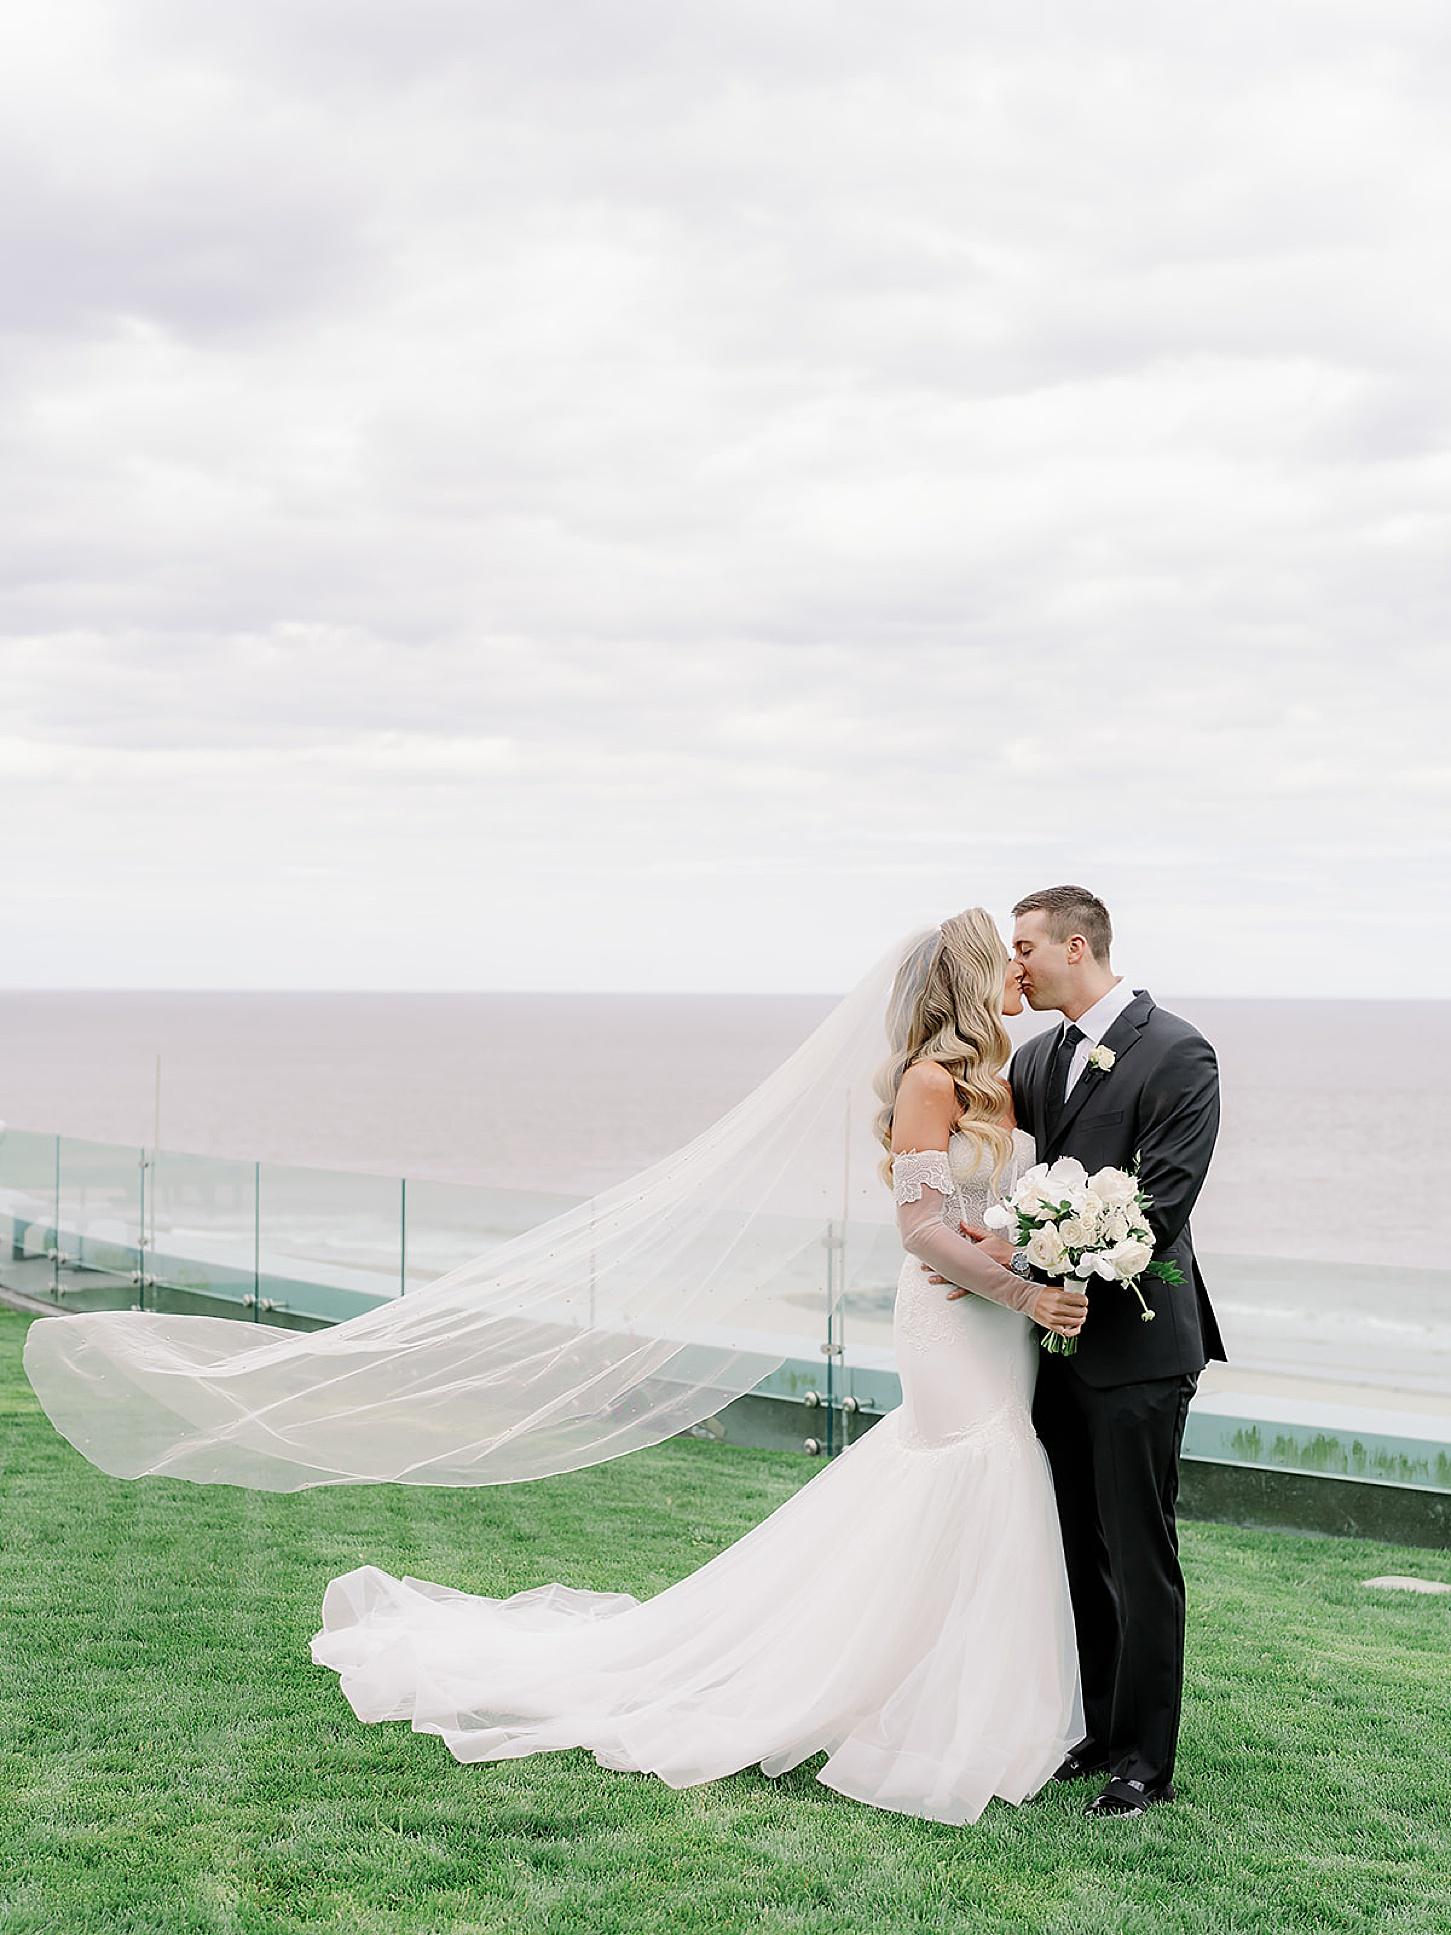 Atlantic City Wedding Photography Studio by Magdalena Studios Lexy Cha 0052